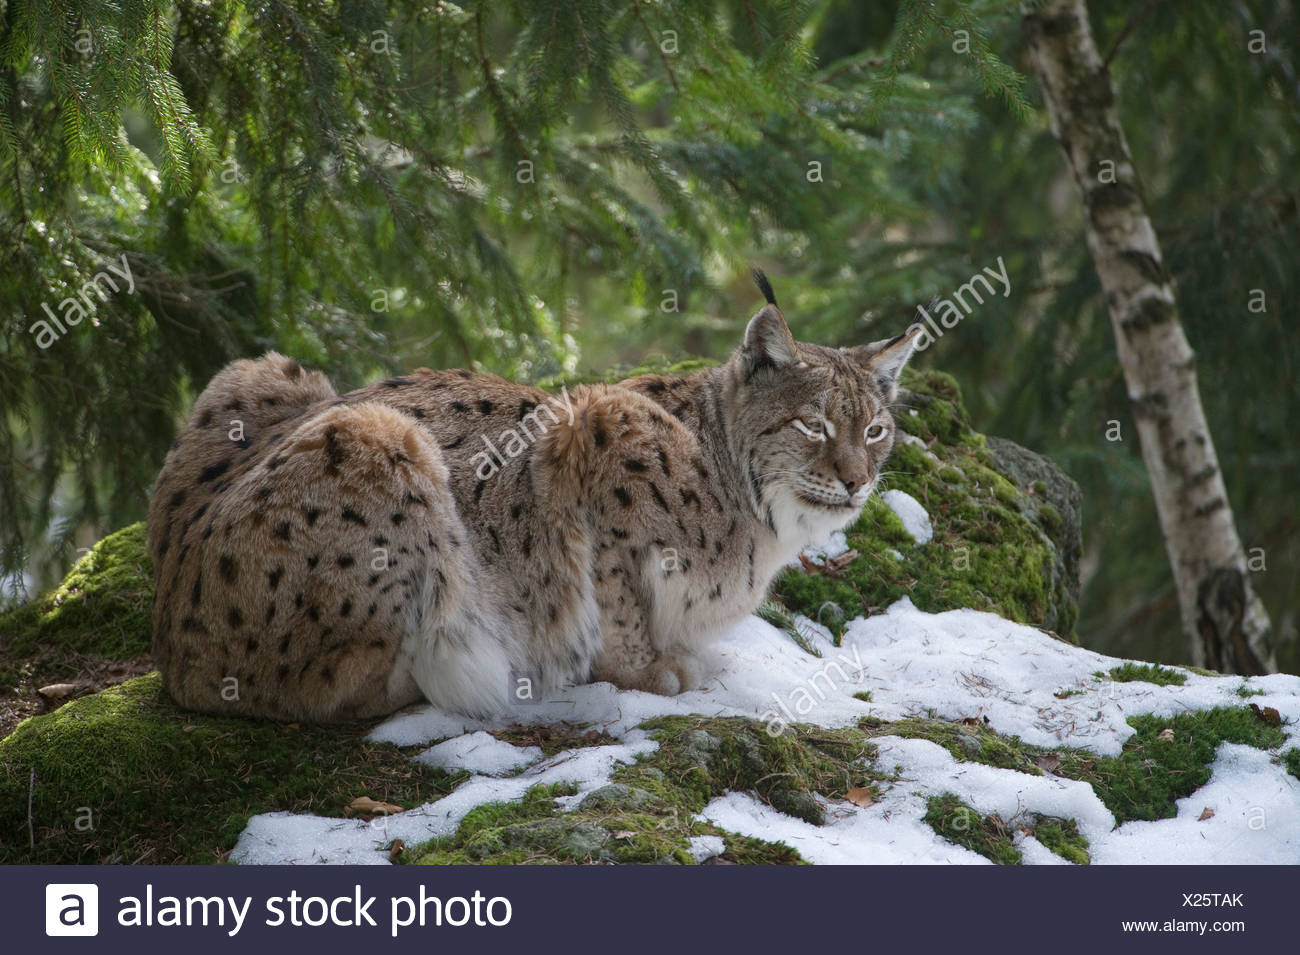 Lynx (Lynx lynx) in the snow, Bavarian Forest National Park, enclosed area, Neuschoenau, Bavaria, Germany, Europe - Stock Image